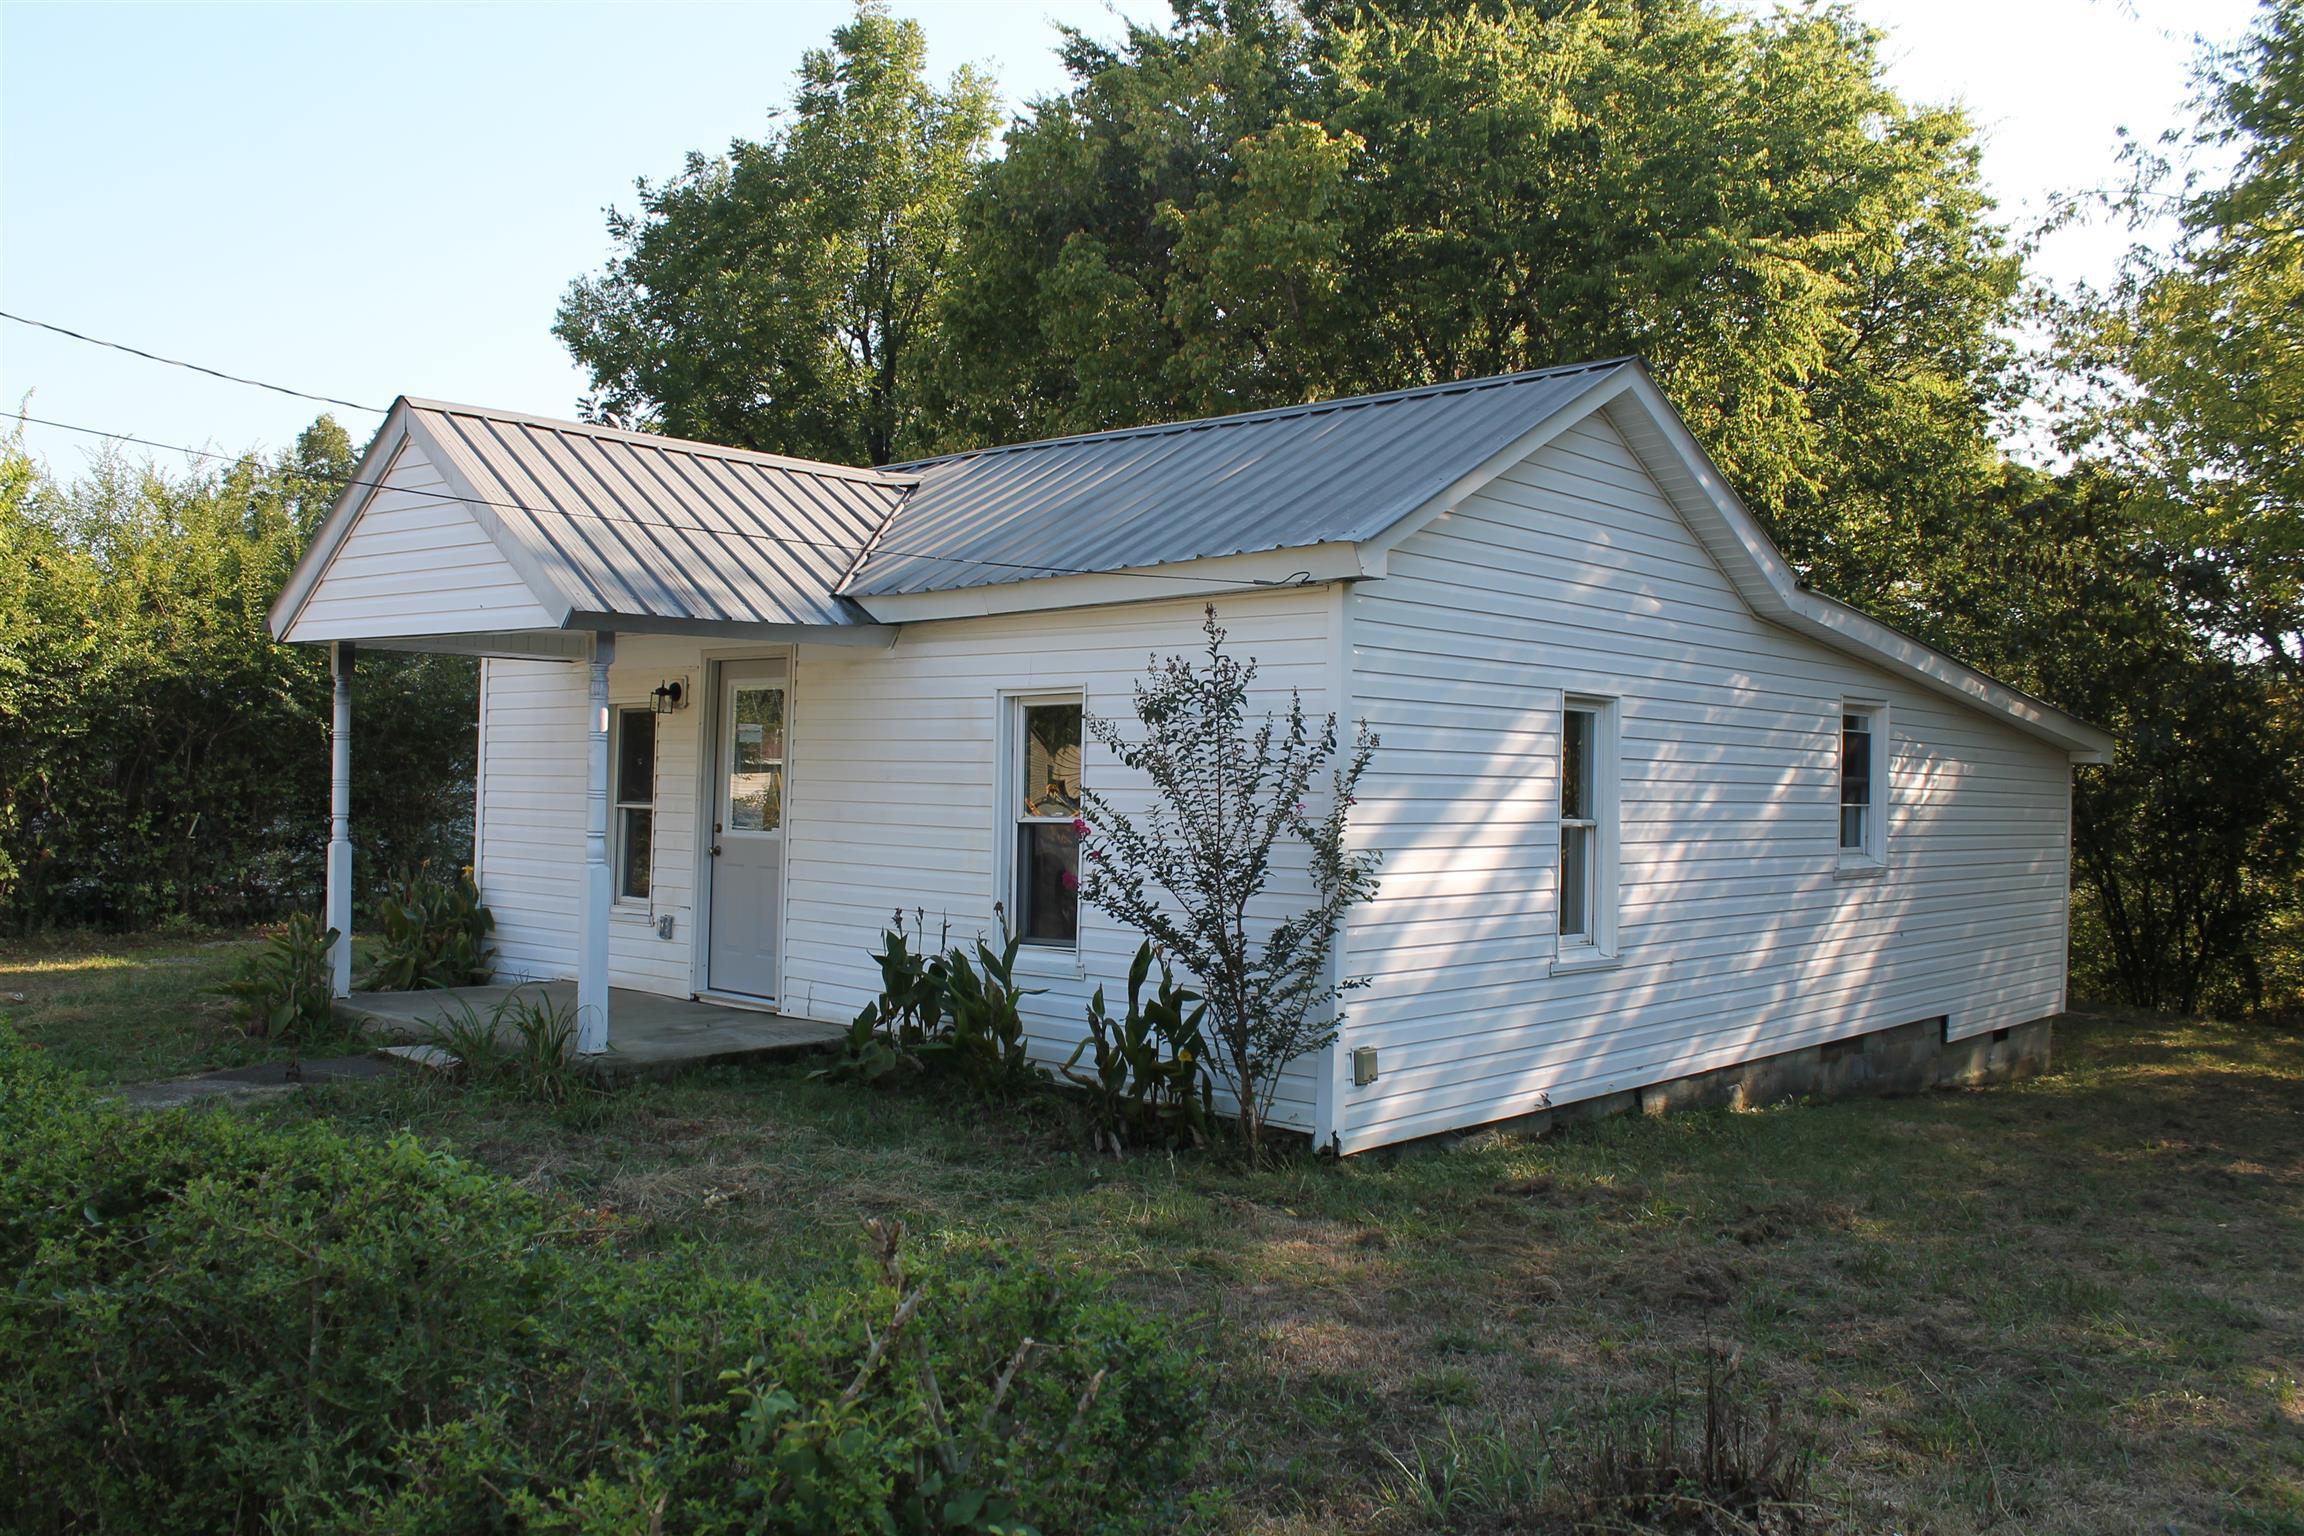 504 Reavis St Property Photo - Tullahoma, TN real estate listing